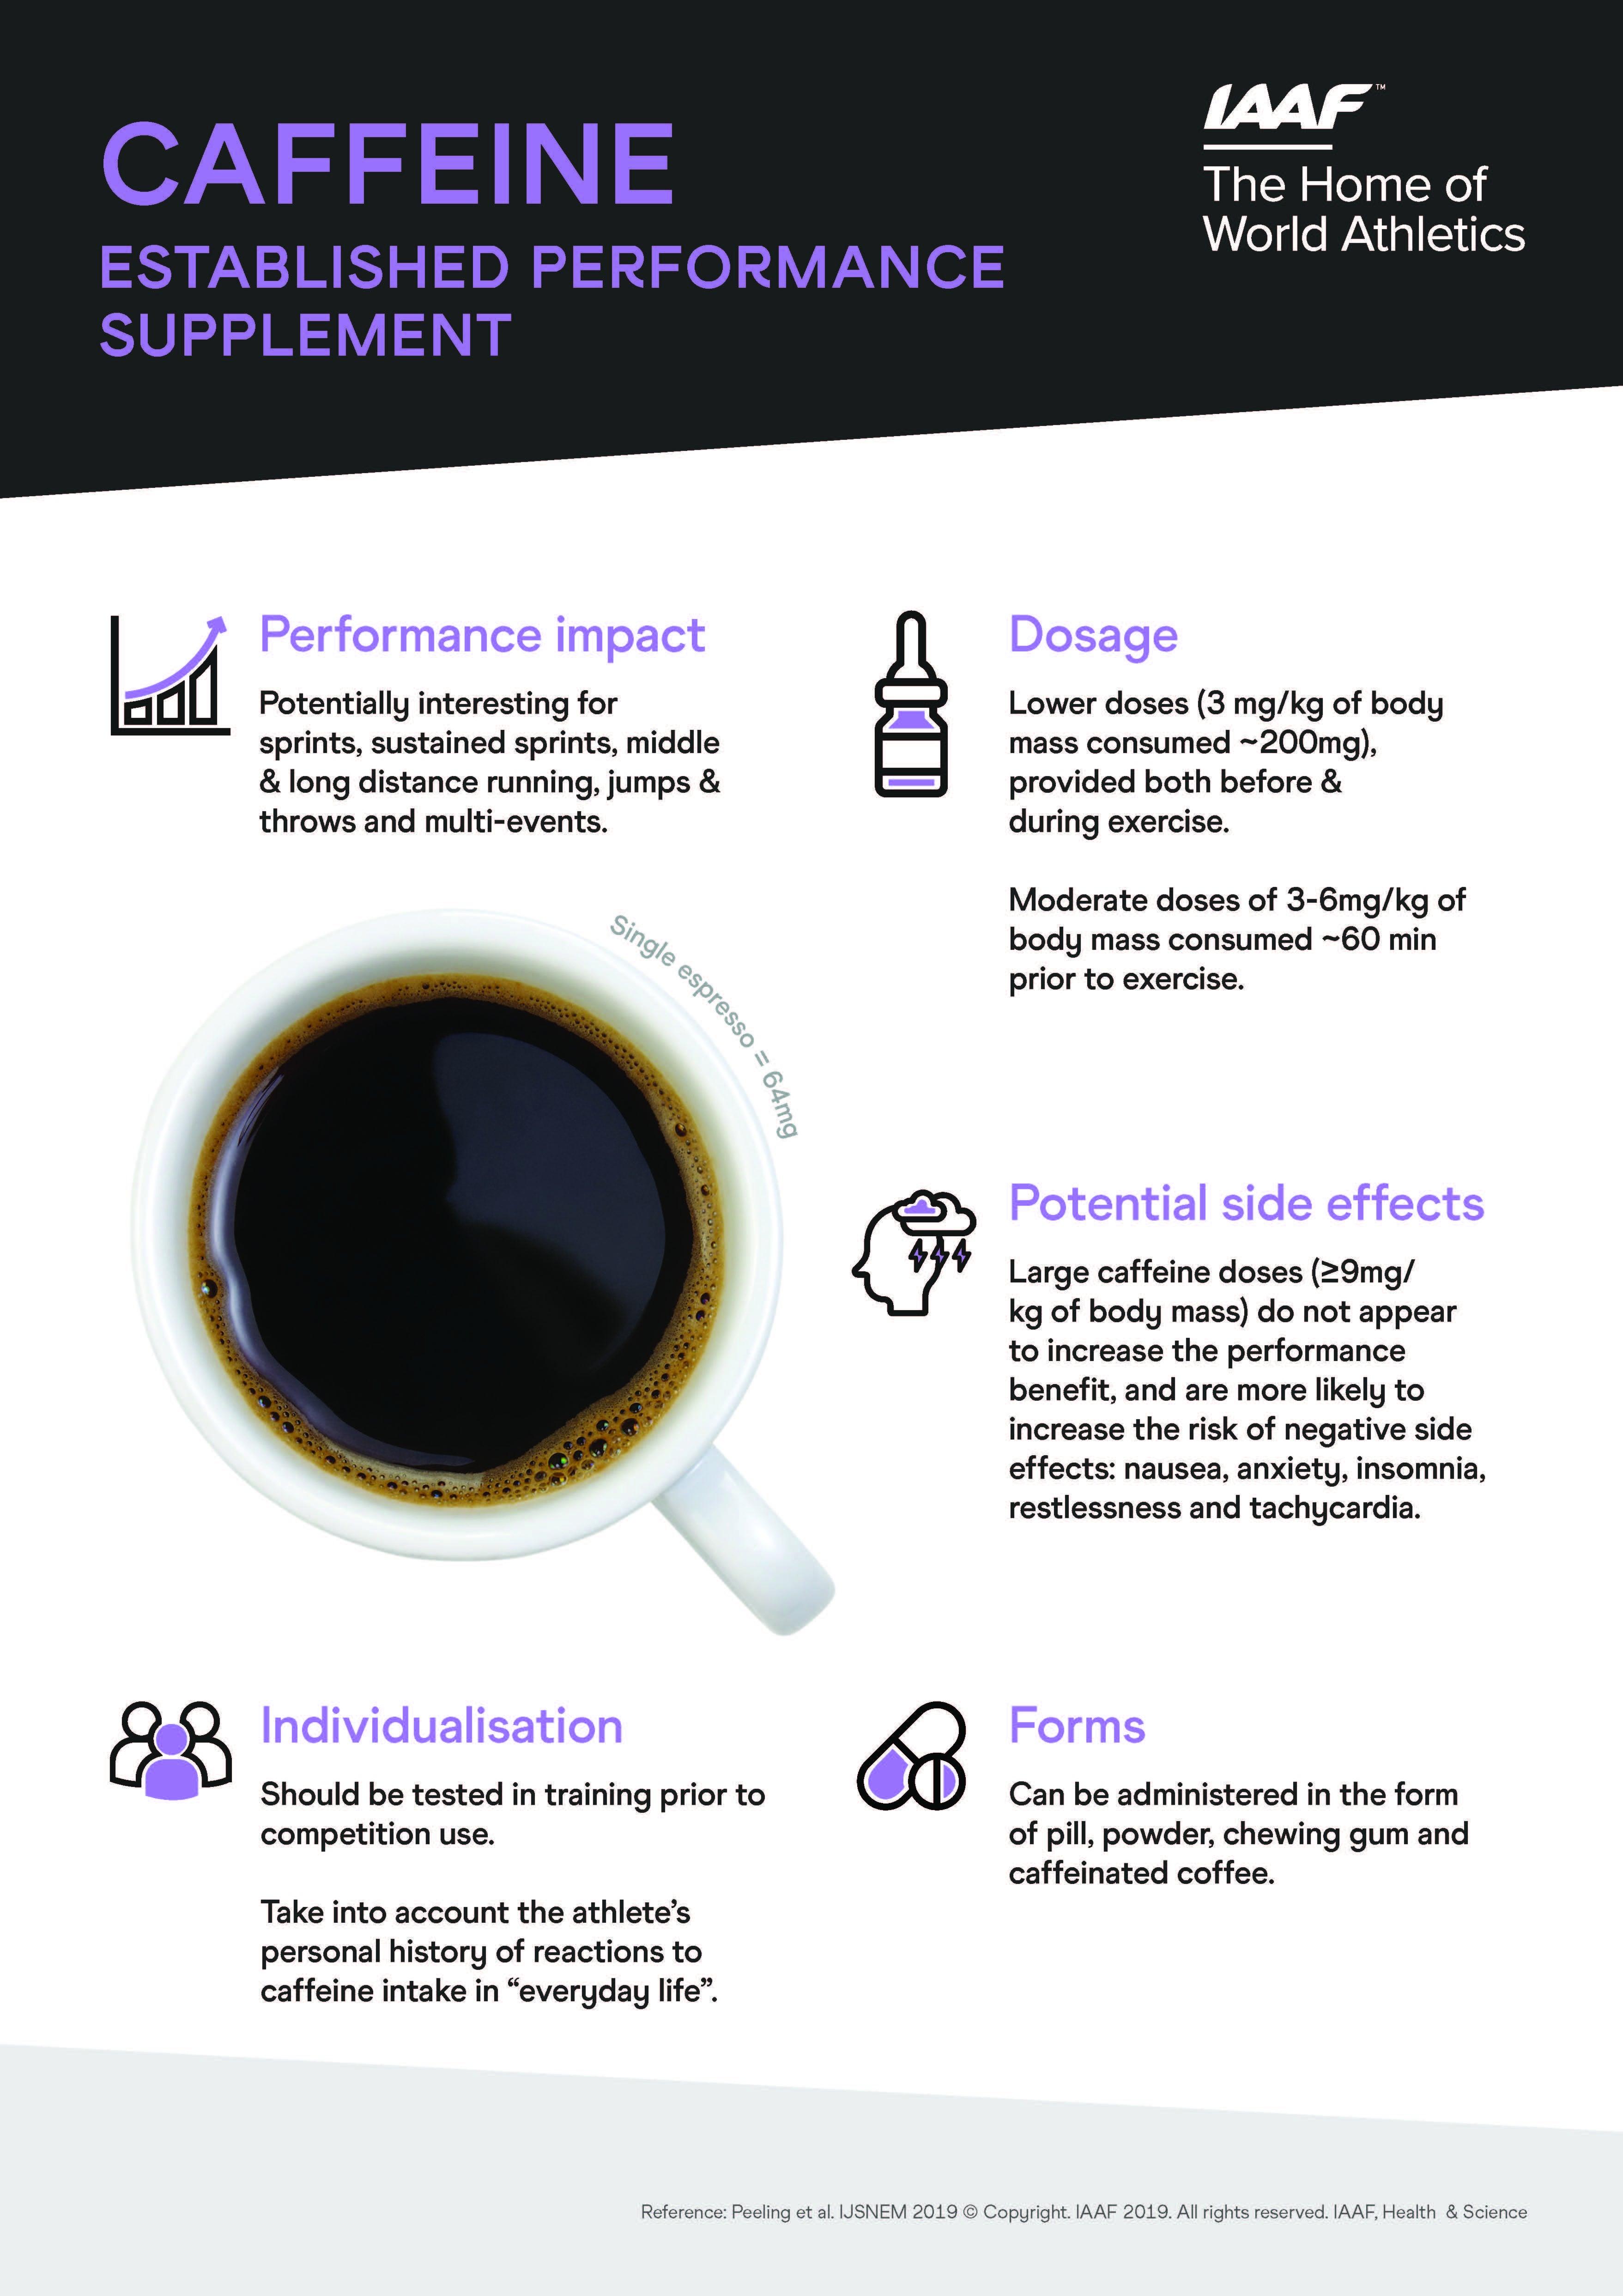 Sports nutrition infographic - caffeine